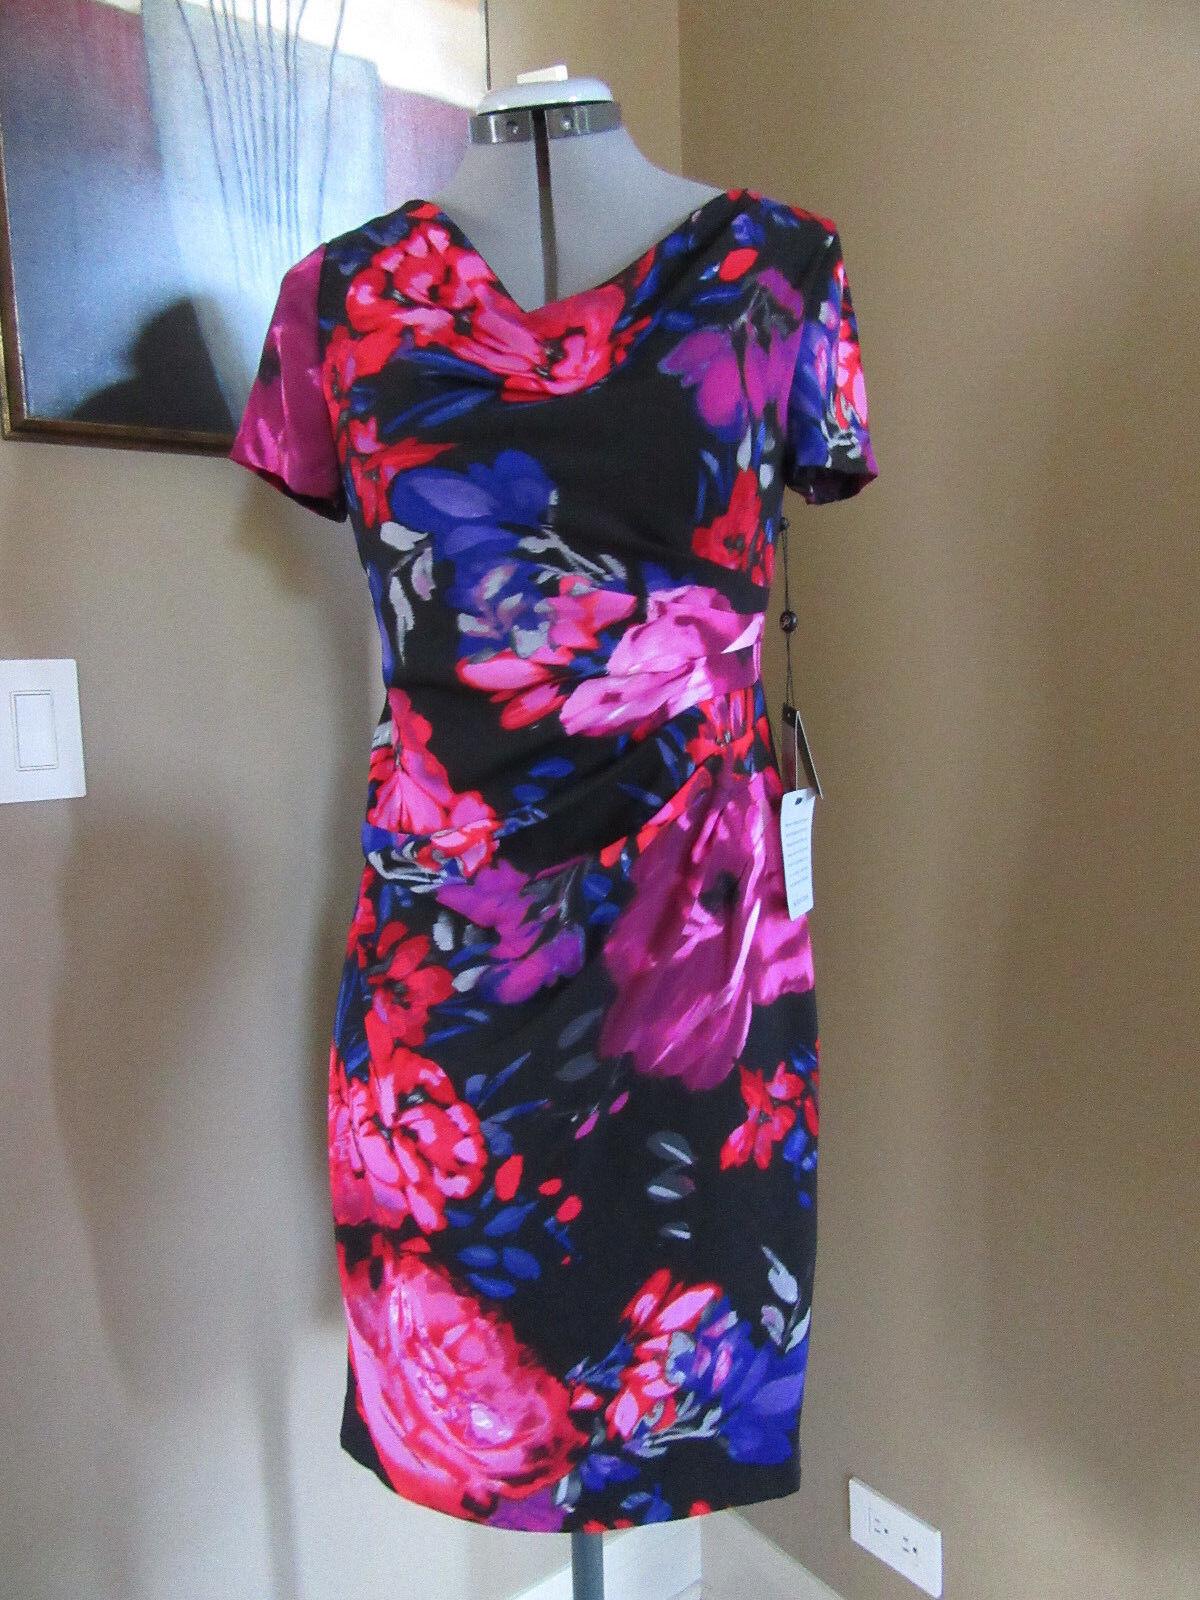 NWT Adrianna Papell Multi Farbe Floral Pleat Crepe Sheath Dress Größe Petite 8